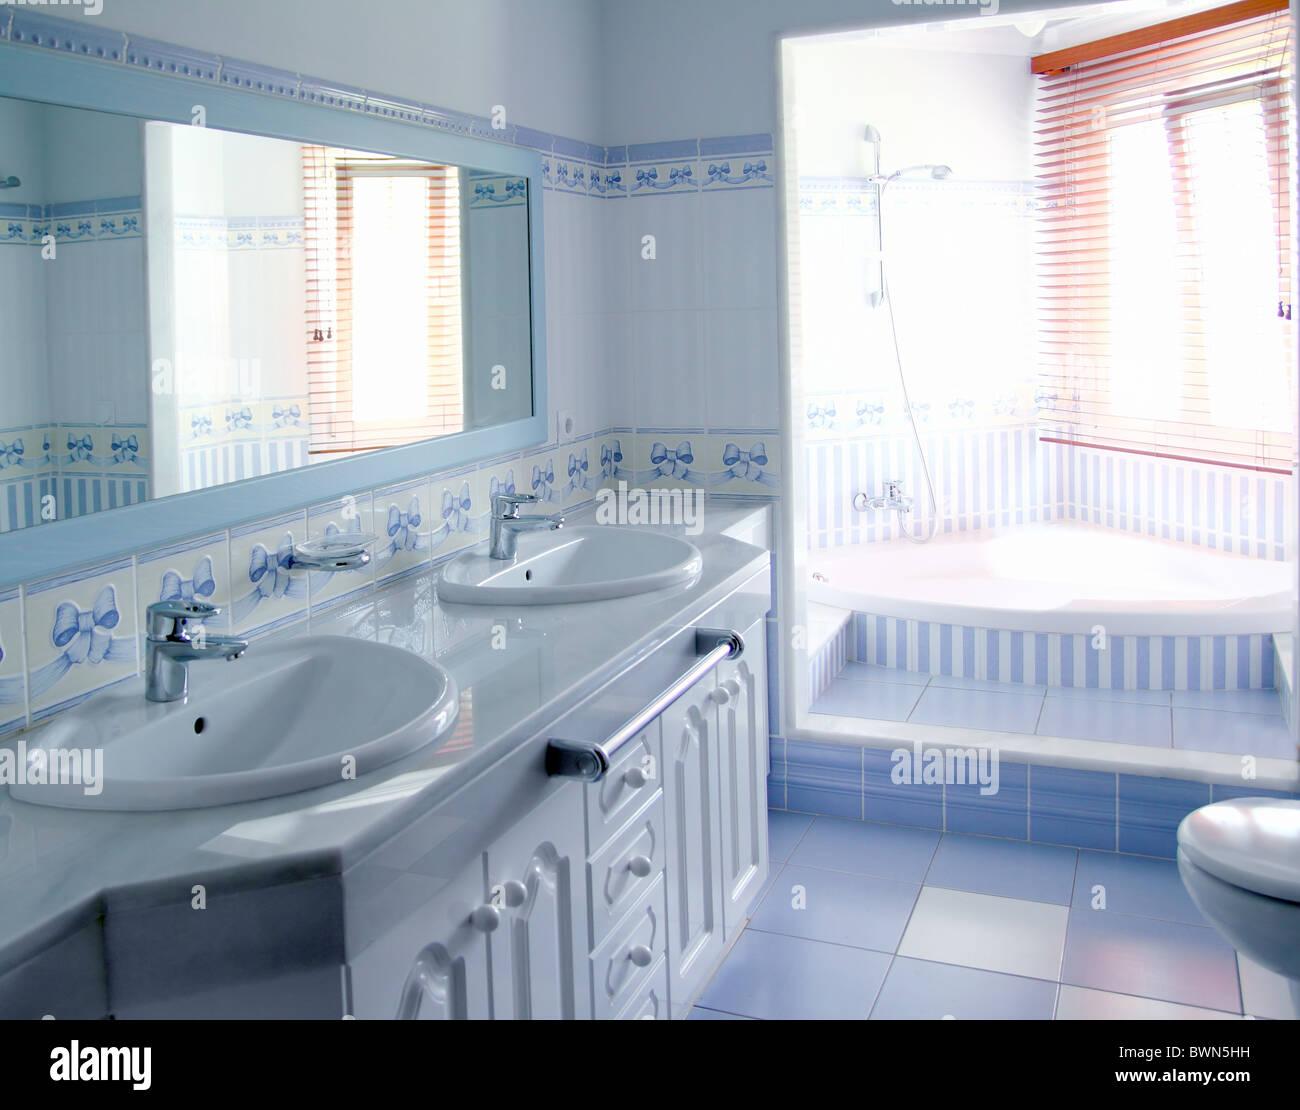 Amazing Picture Of Bathroom Tiles Ideas - Bathroom - knawi.com